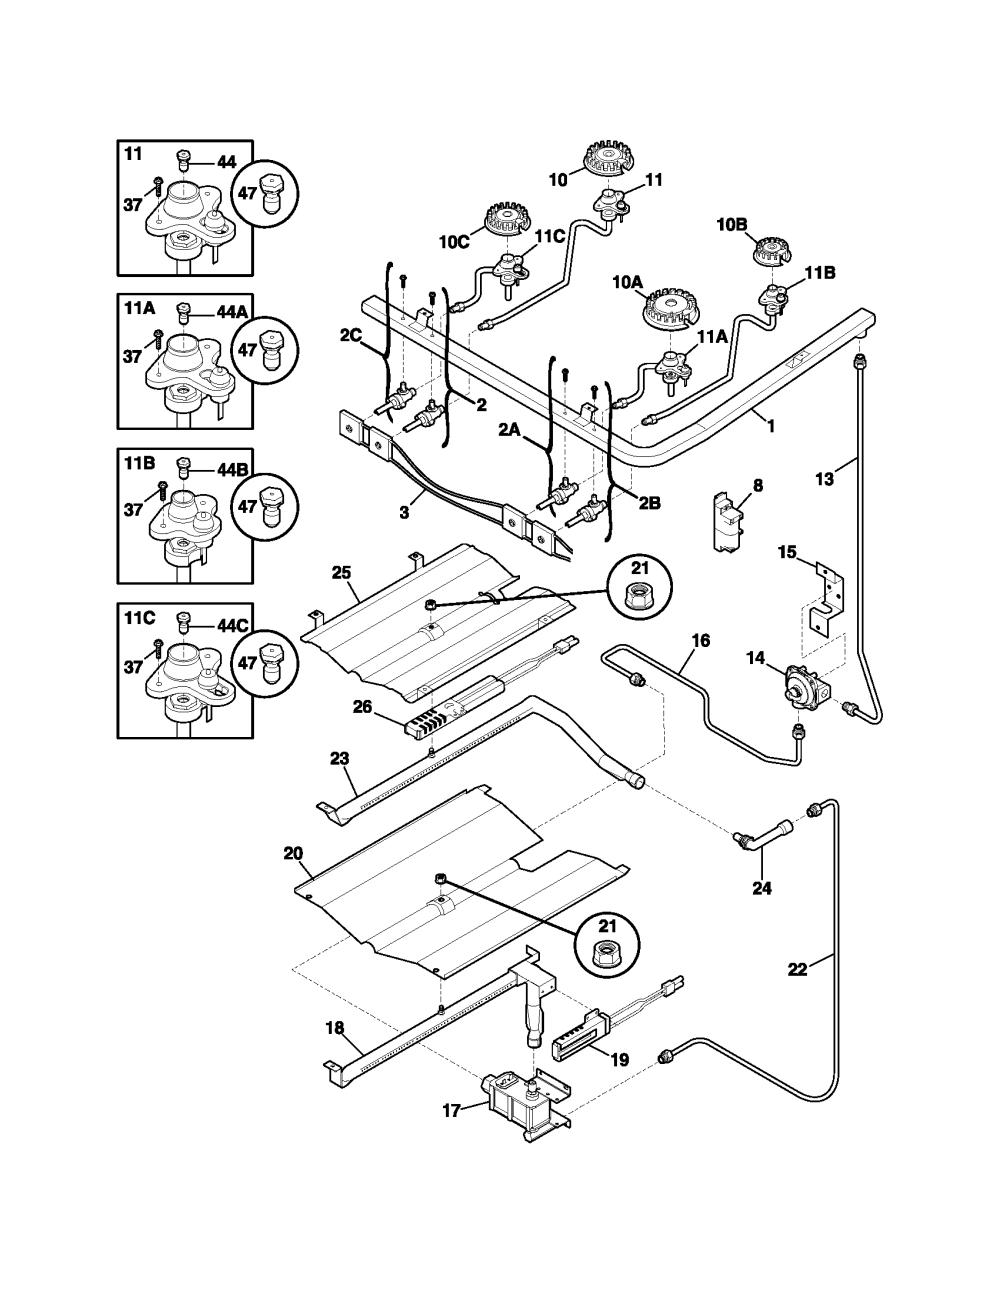 medium resolution of frigidaire model plgf389ccc free standing gas genuine partsfrigidaire gas range wiring diagram 8